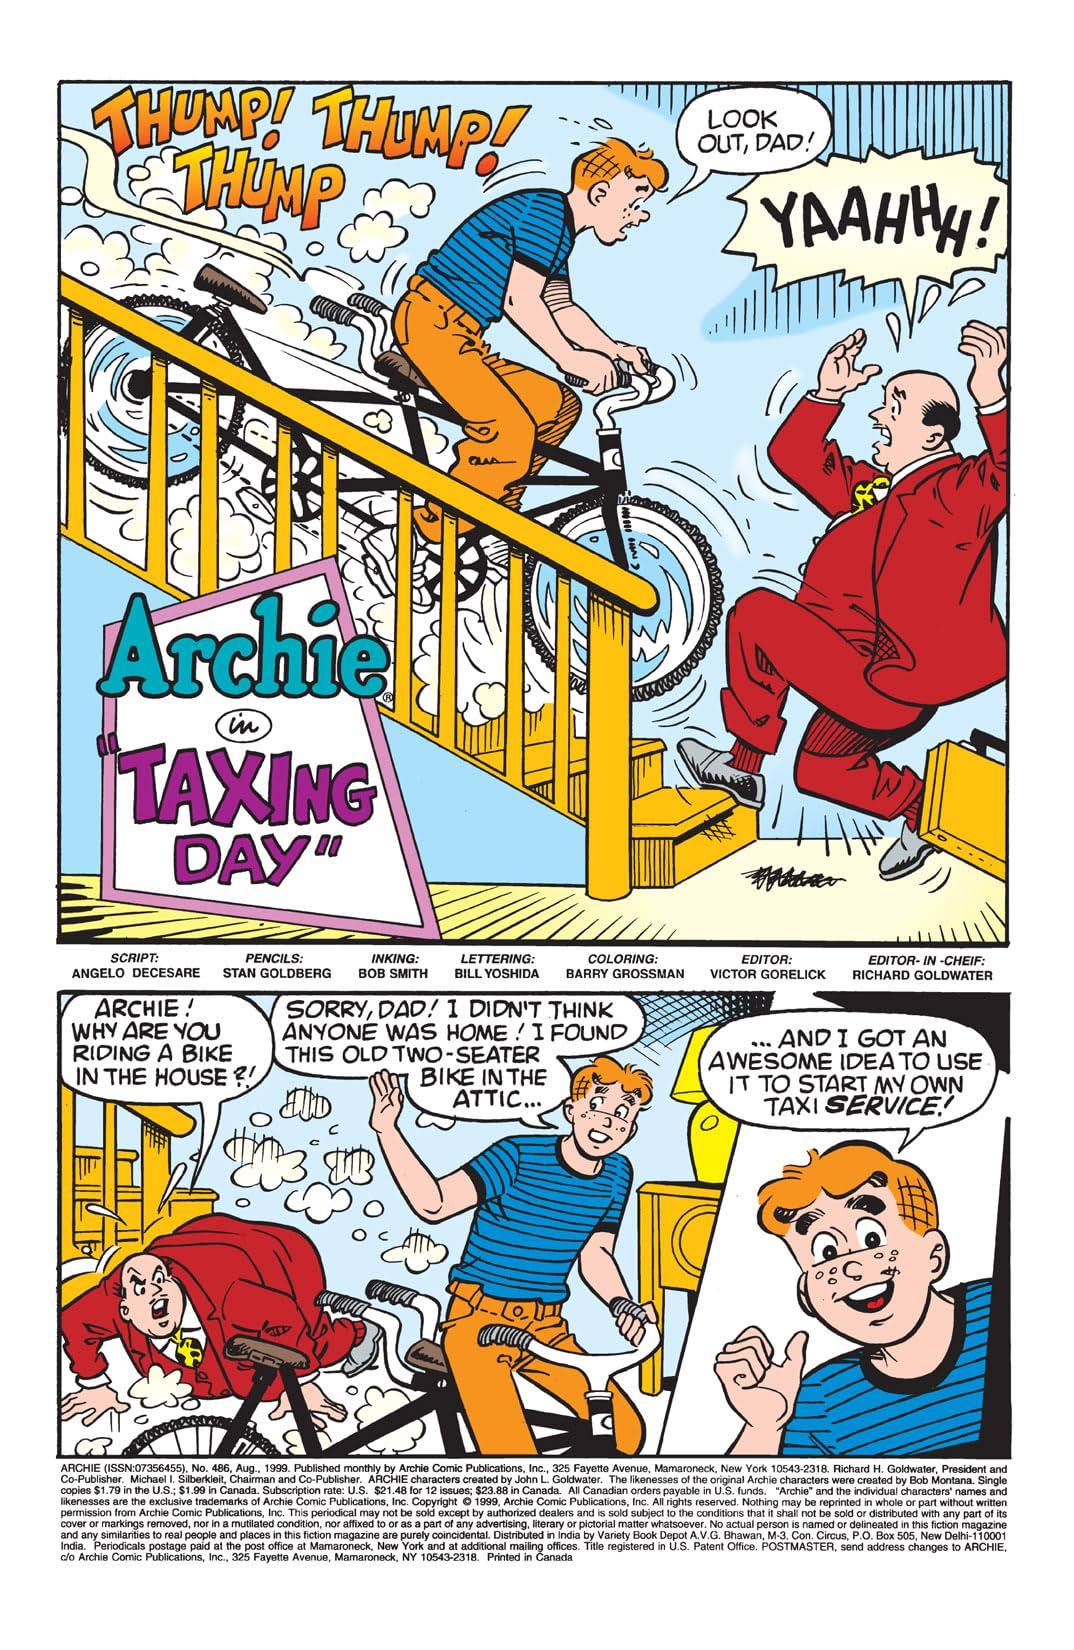 Archie #486